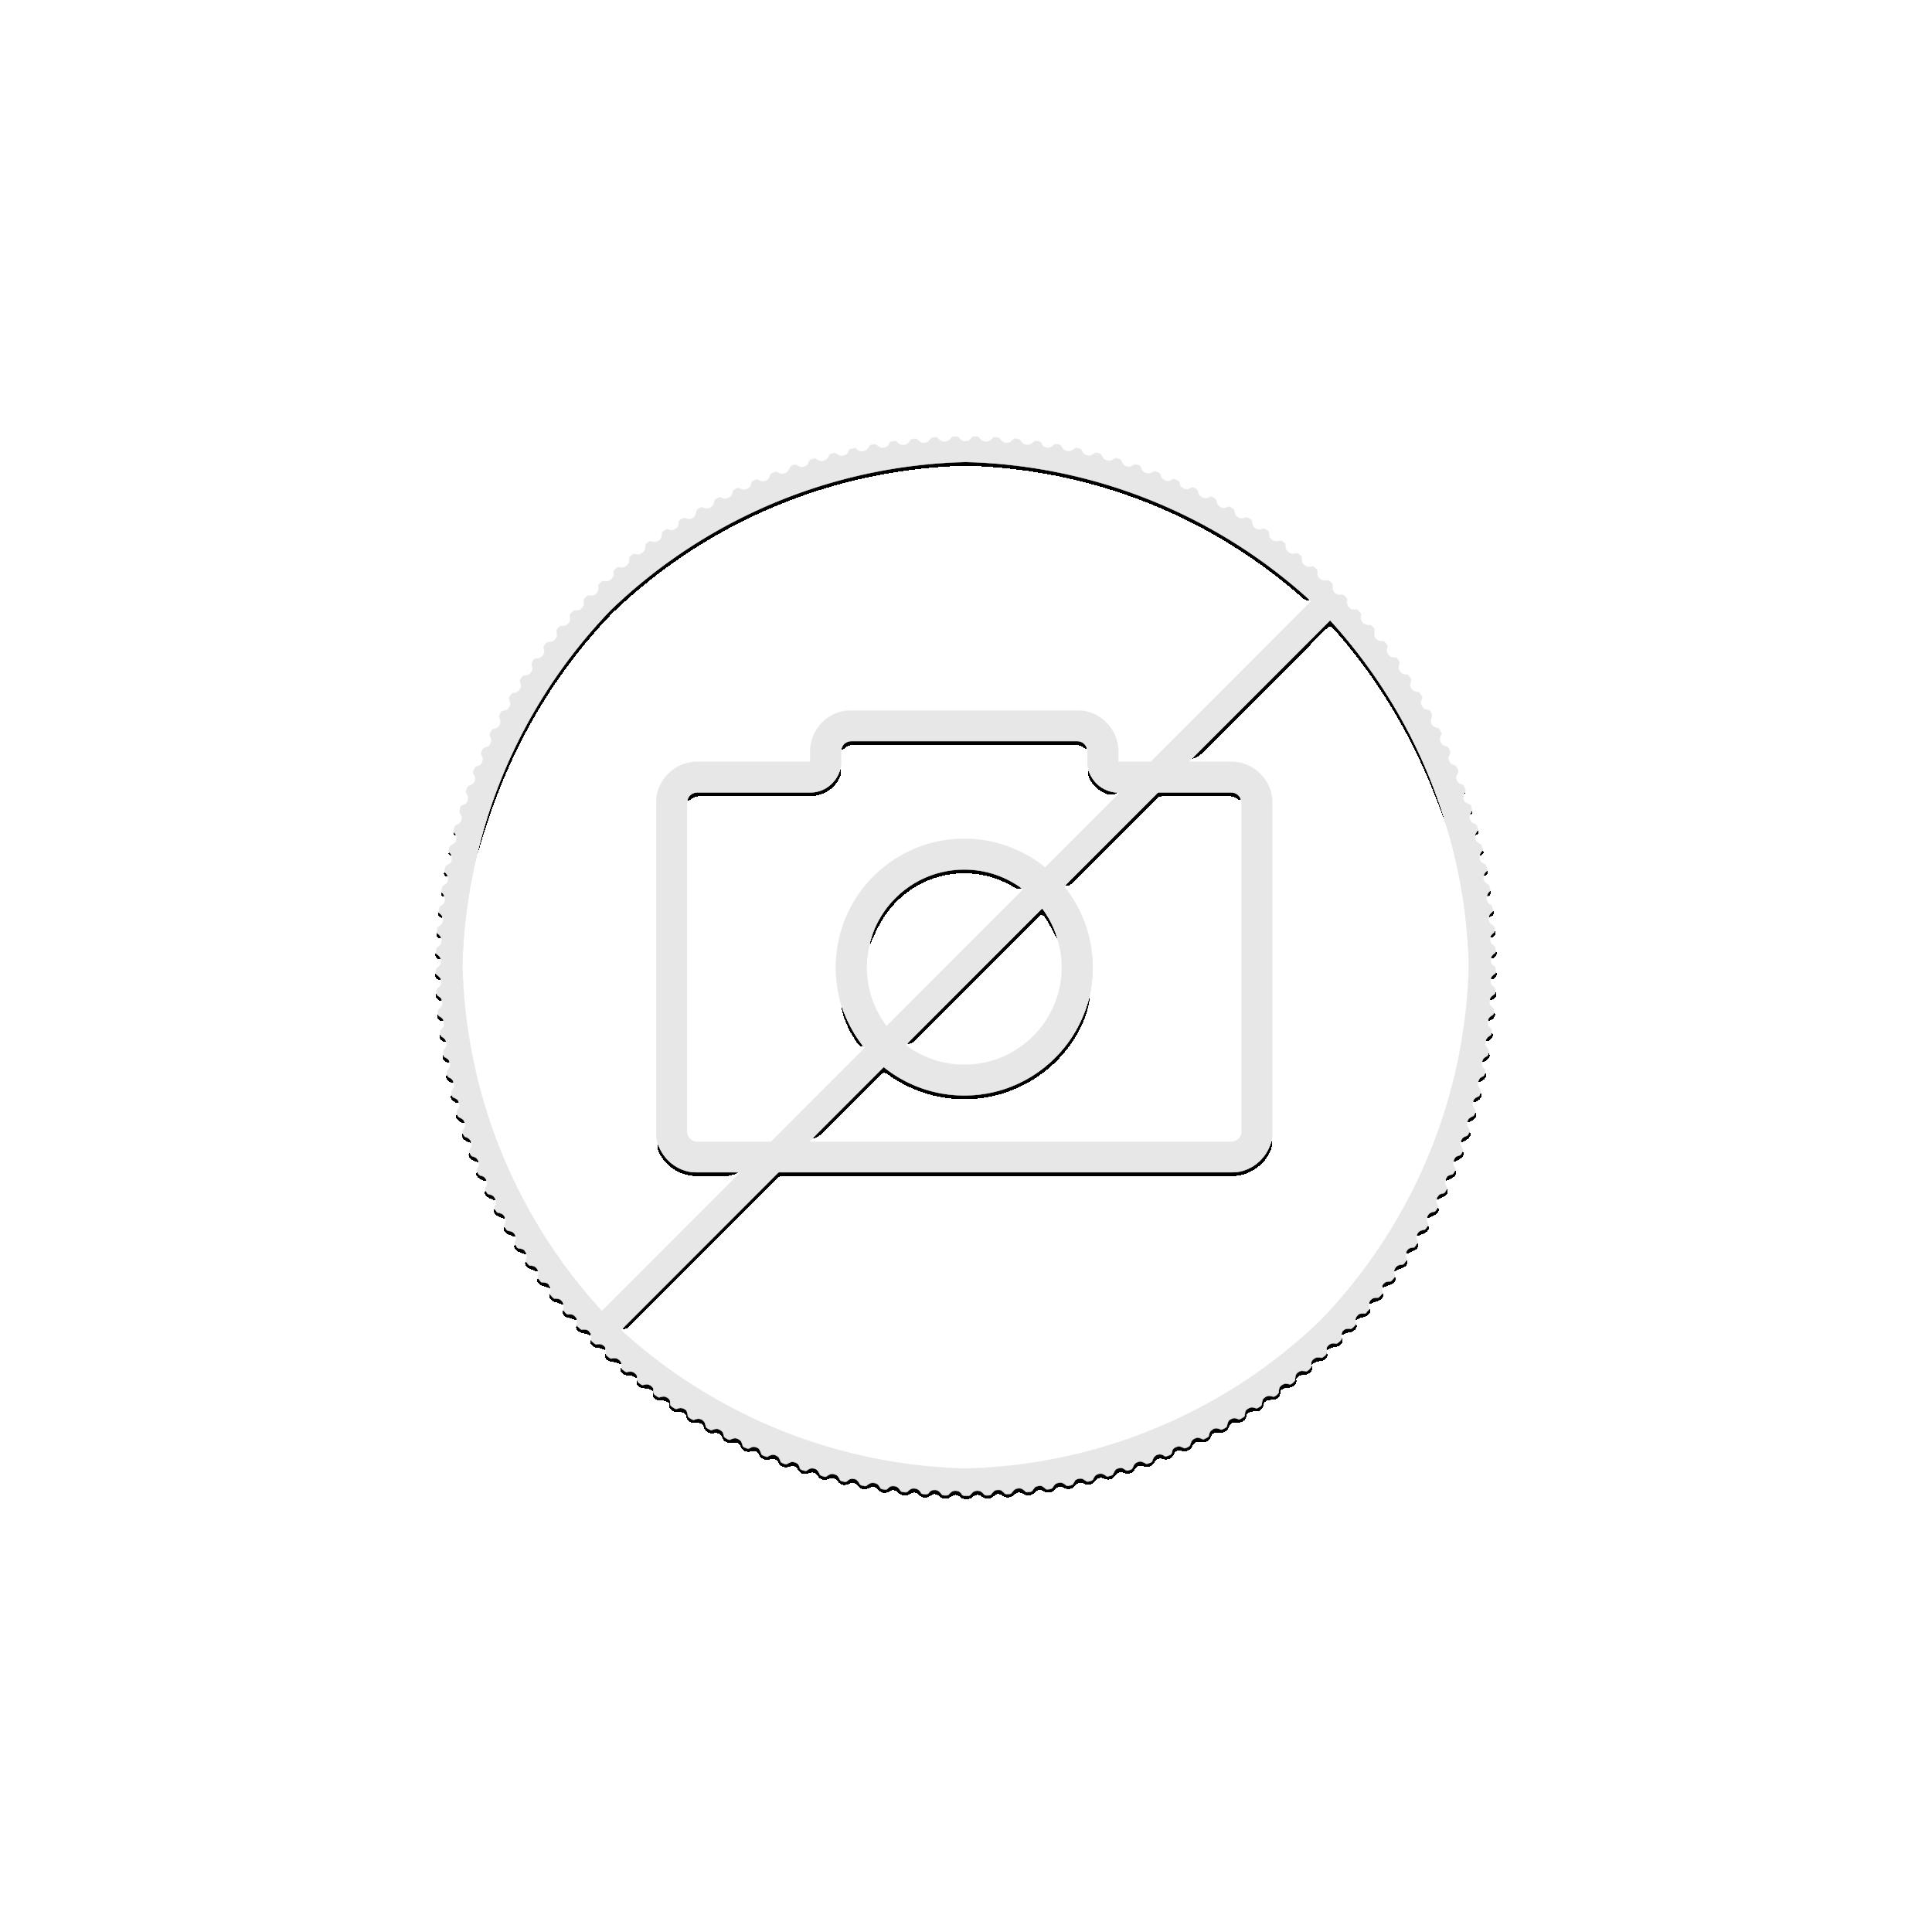 1/2 oz gold Britannia 2021 coin